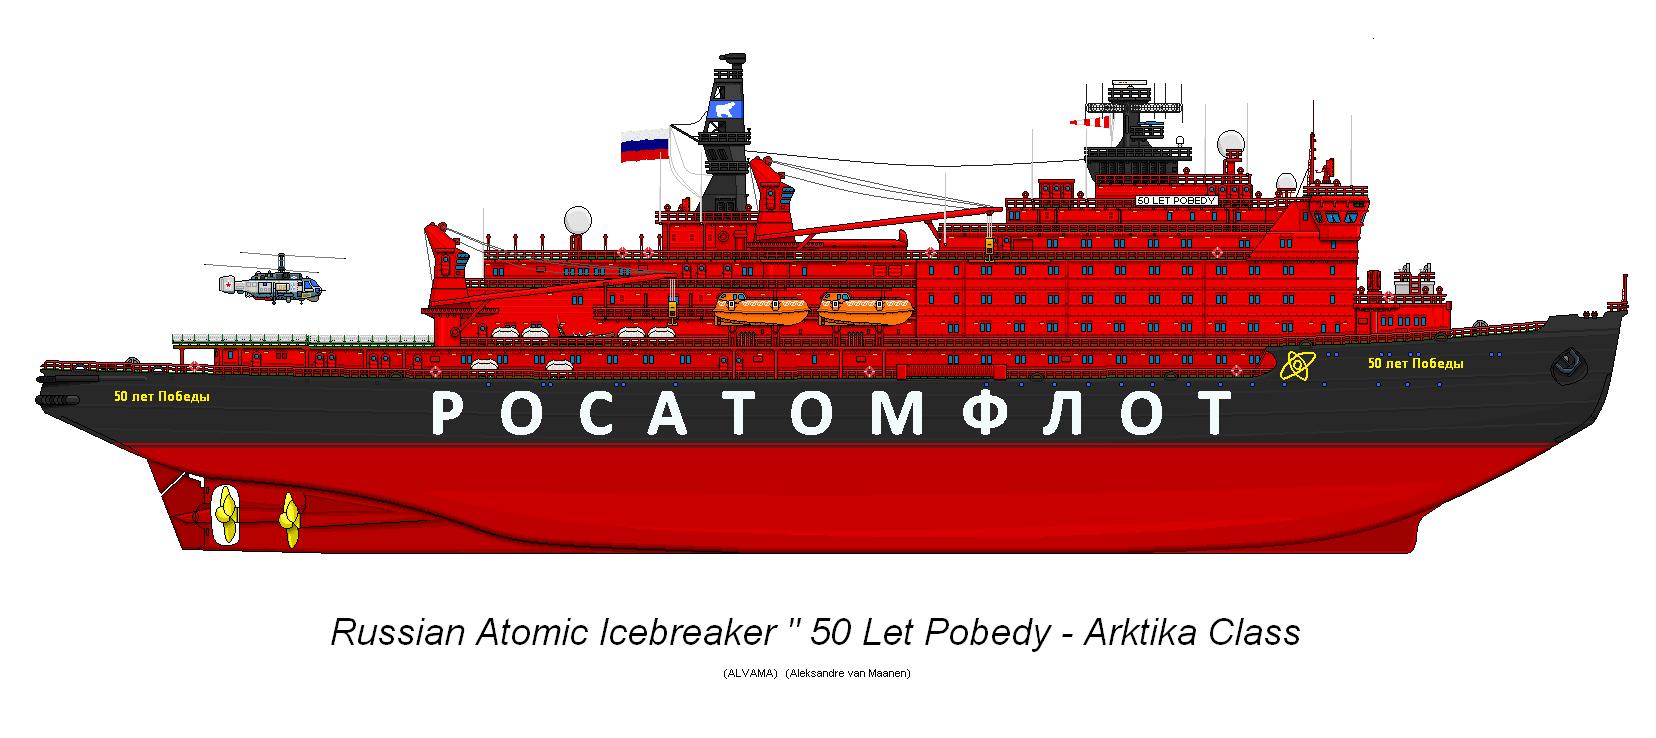 russian_icebreaker_50_let_pobedy__pixel_art__by_kara_alvama-d5g2ygi